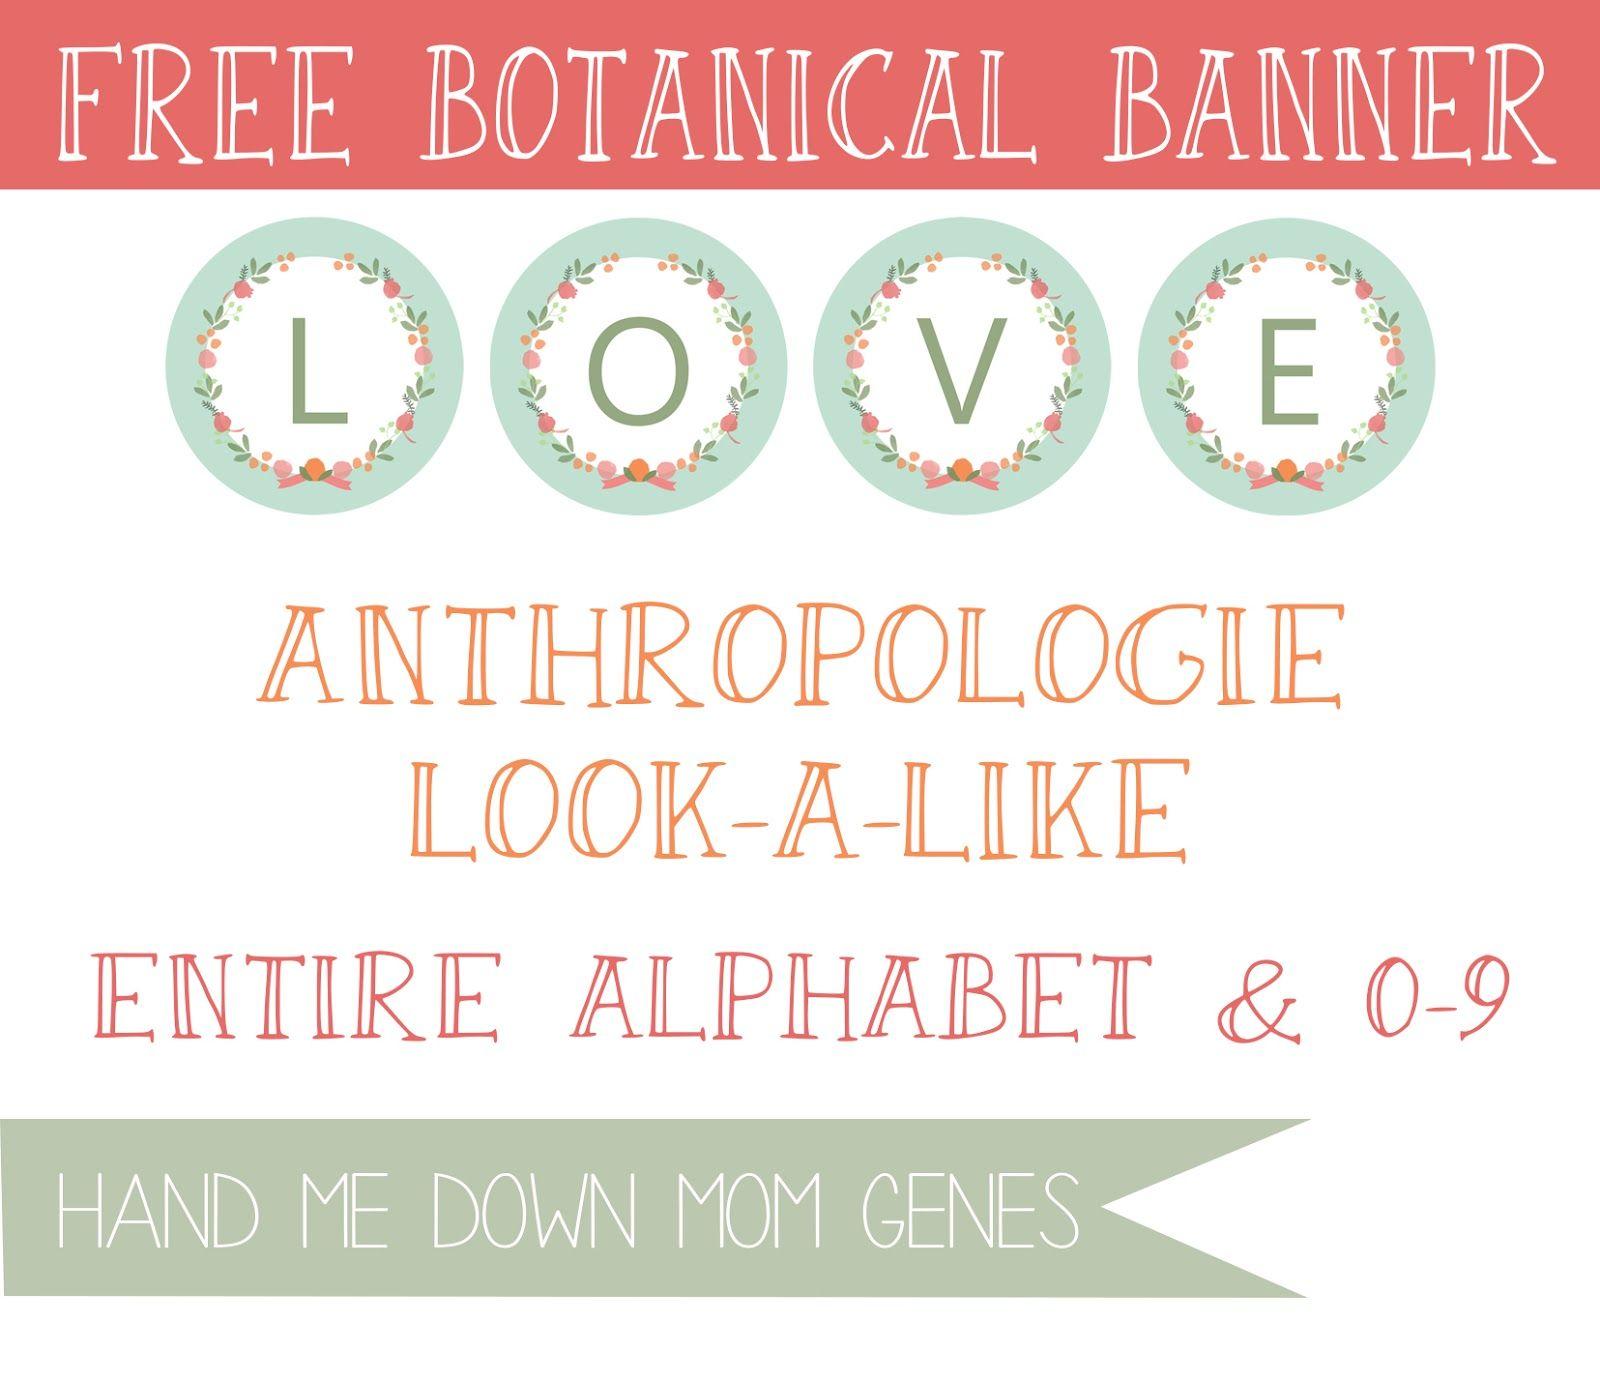 Hand Me Down Mom Genes: Anthropologie Look-a-Like: Botanical Banner